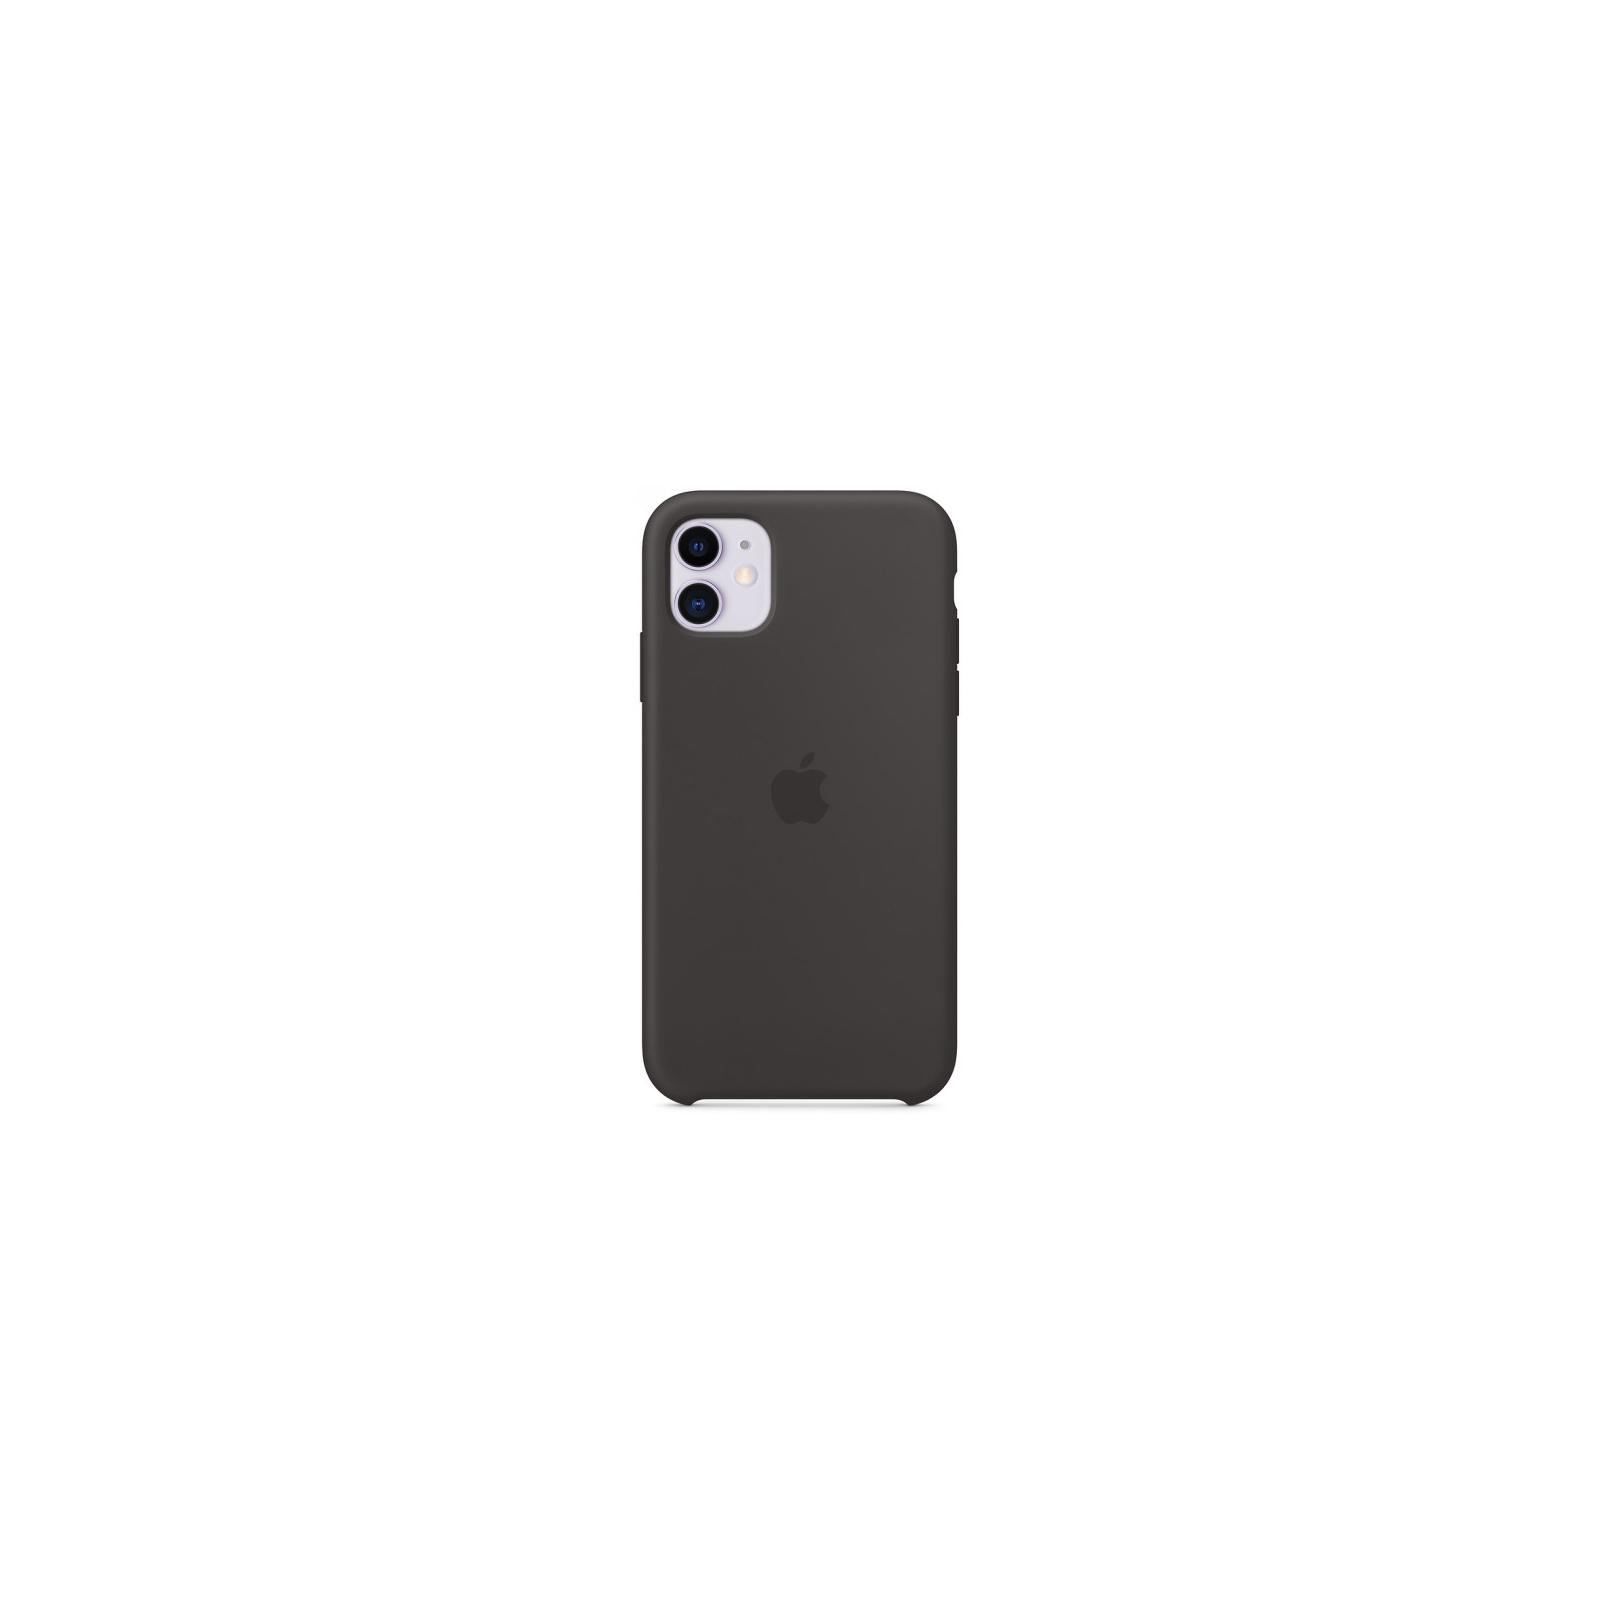 Чехол для моб. телефона Apple iPhone 11 Silicone Case - Black (MWVU2ZM/A) изображение 5